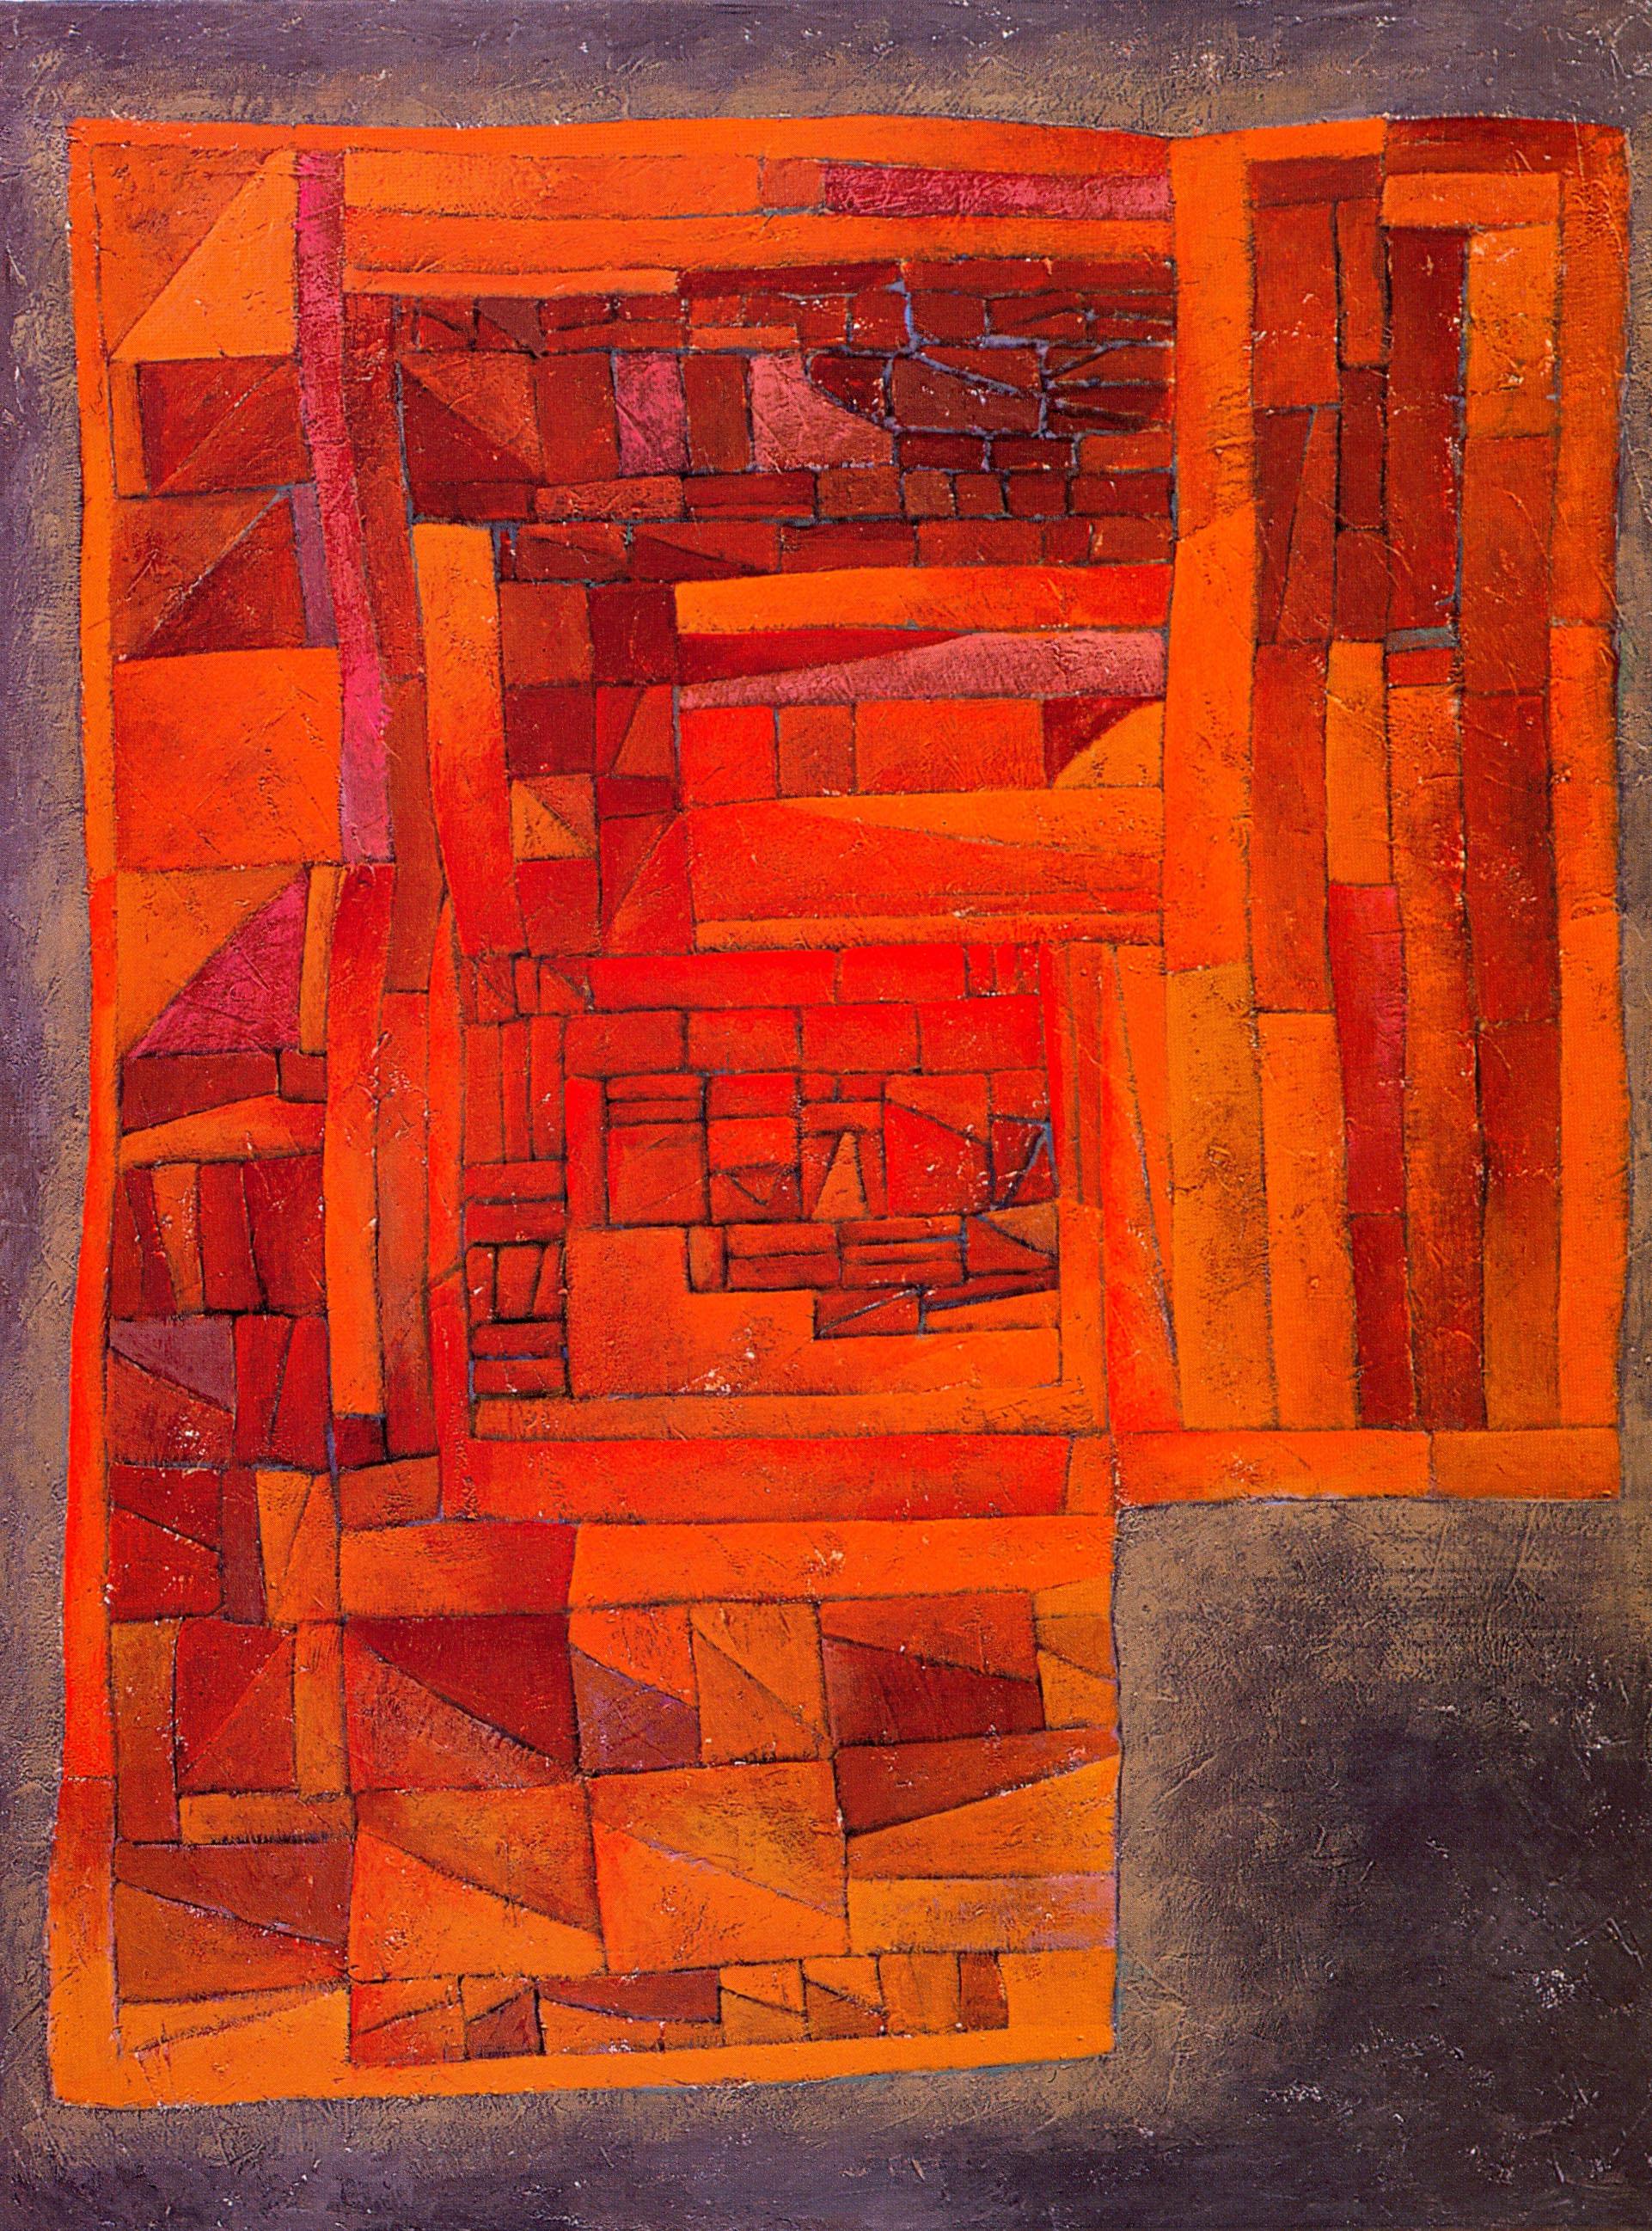 "Road Home #3 (Pojagi #2),   2002, Acrylic on canvas, 48"" x 36"""